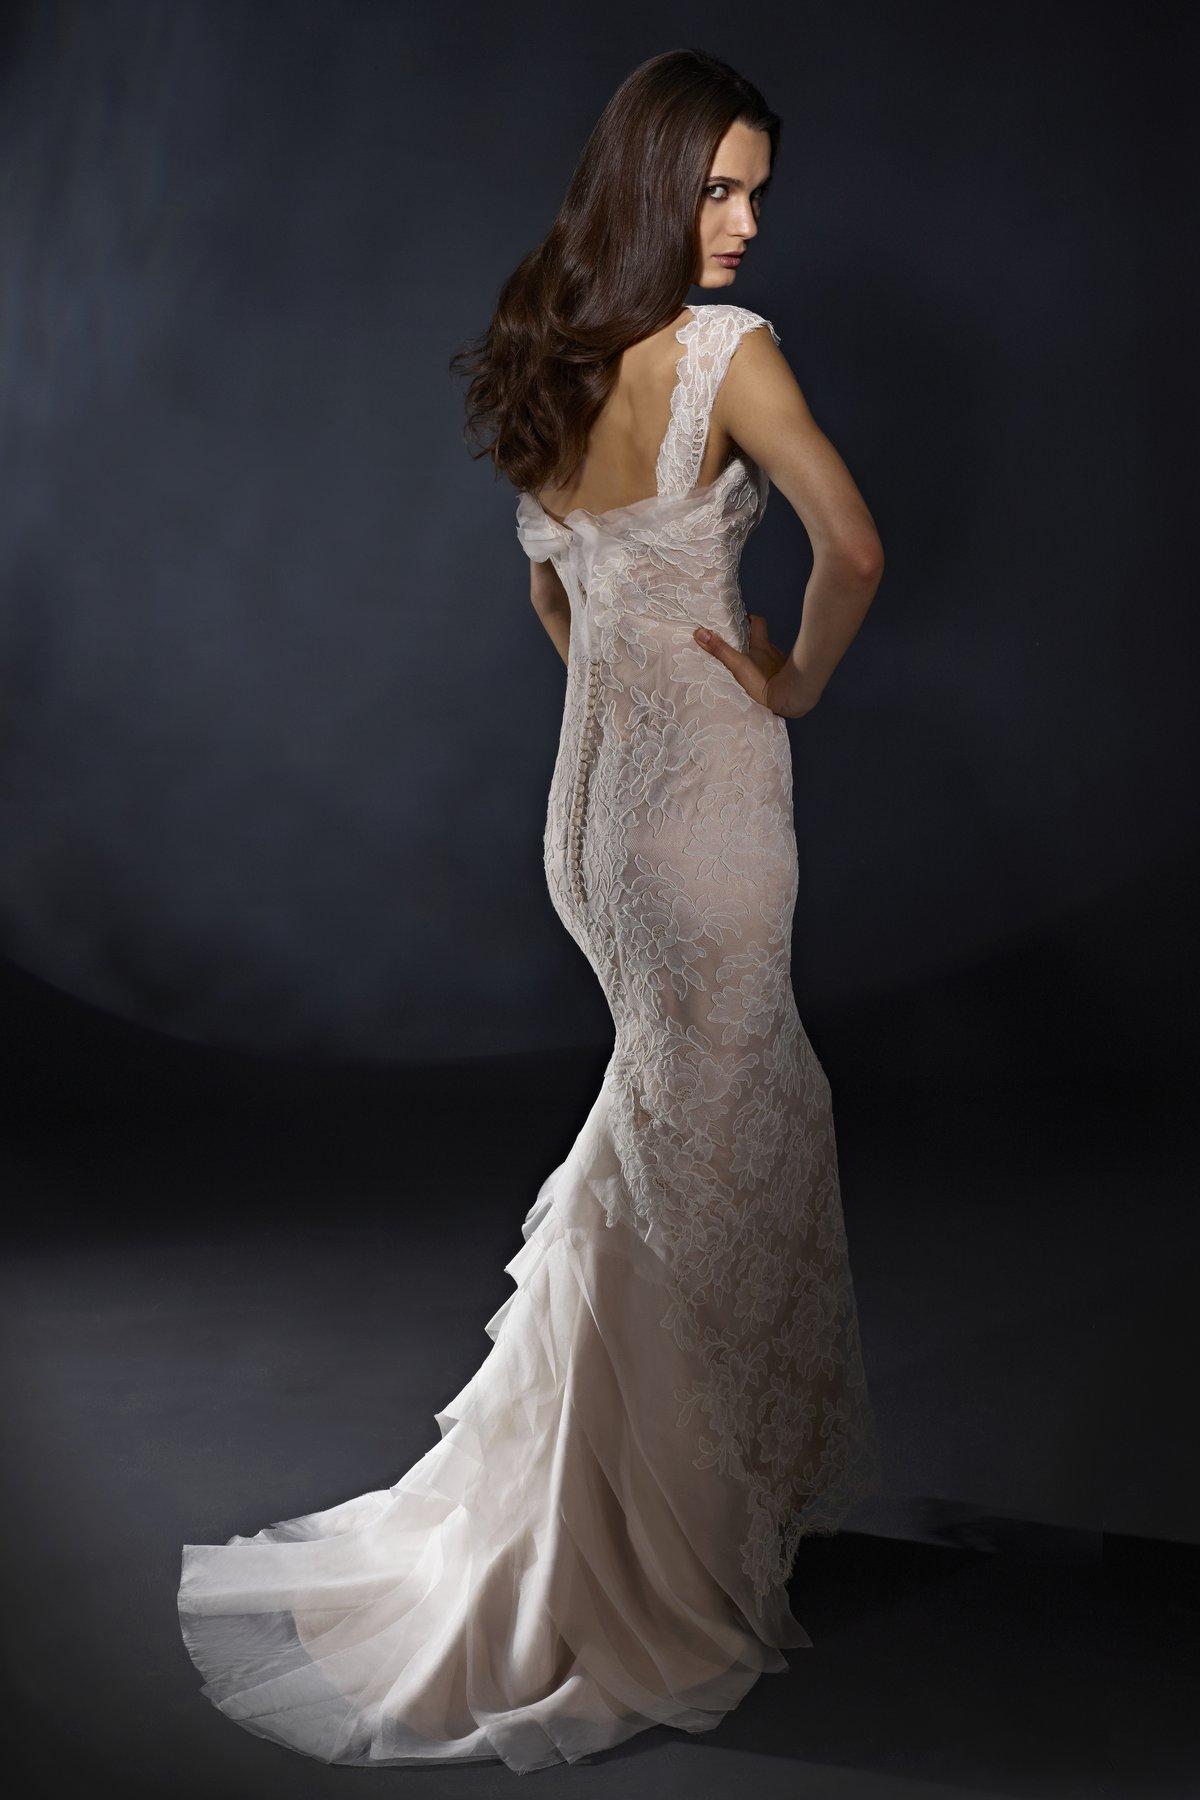 Marisa Bridal Spring 2013 Collection | The FashionBrides